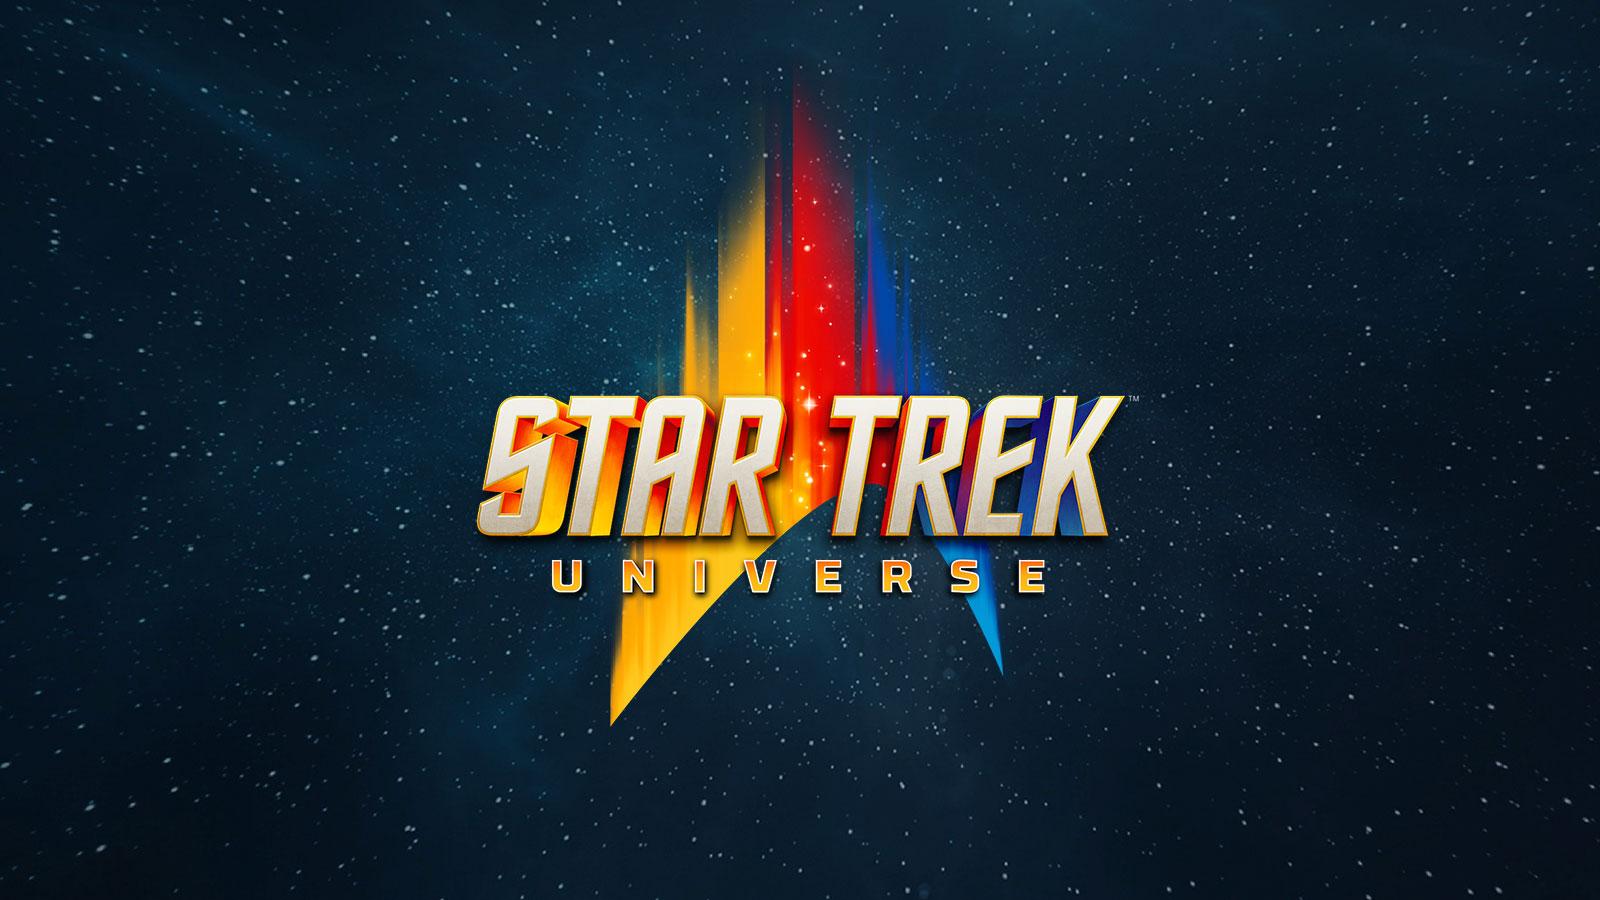 STAR TREK UNIVERSE SDCC Comic-Con@Home Panels Announced